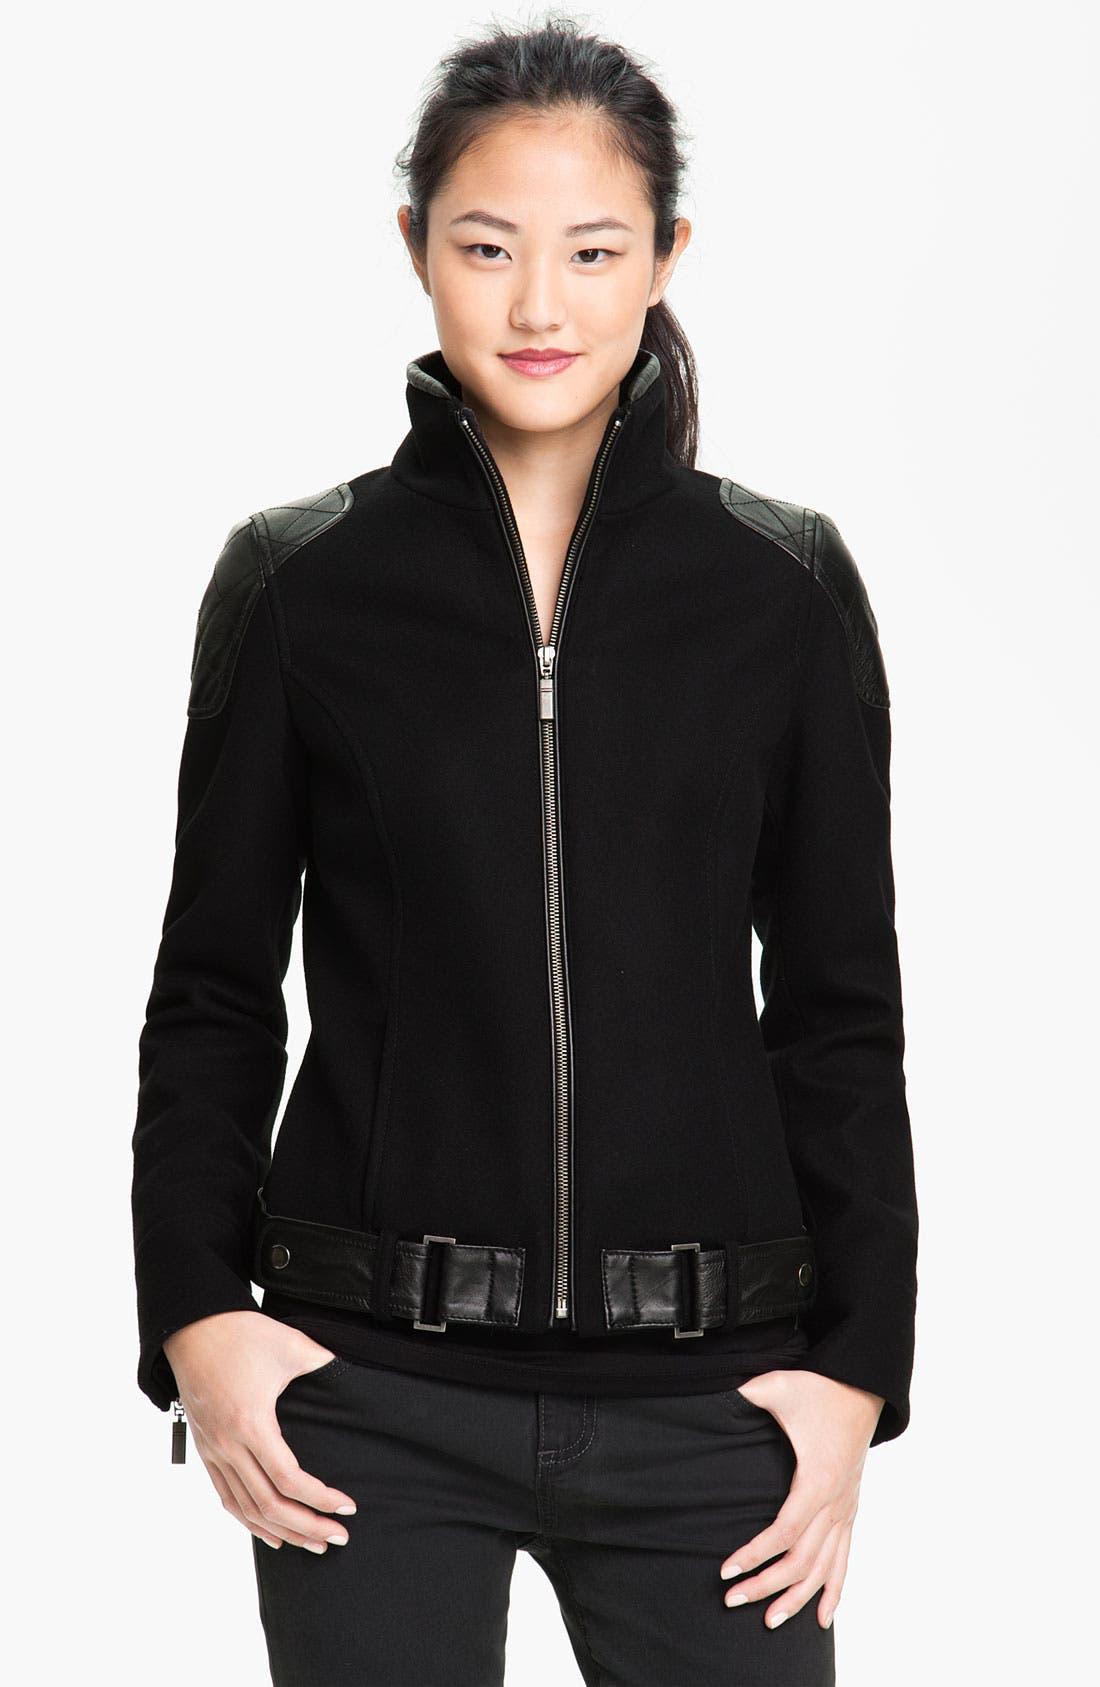 Alternate Image 1 Selected - Trina Turk Leather Trim Moto Jacket